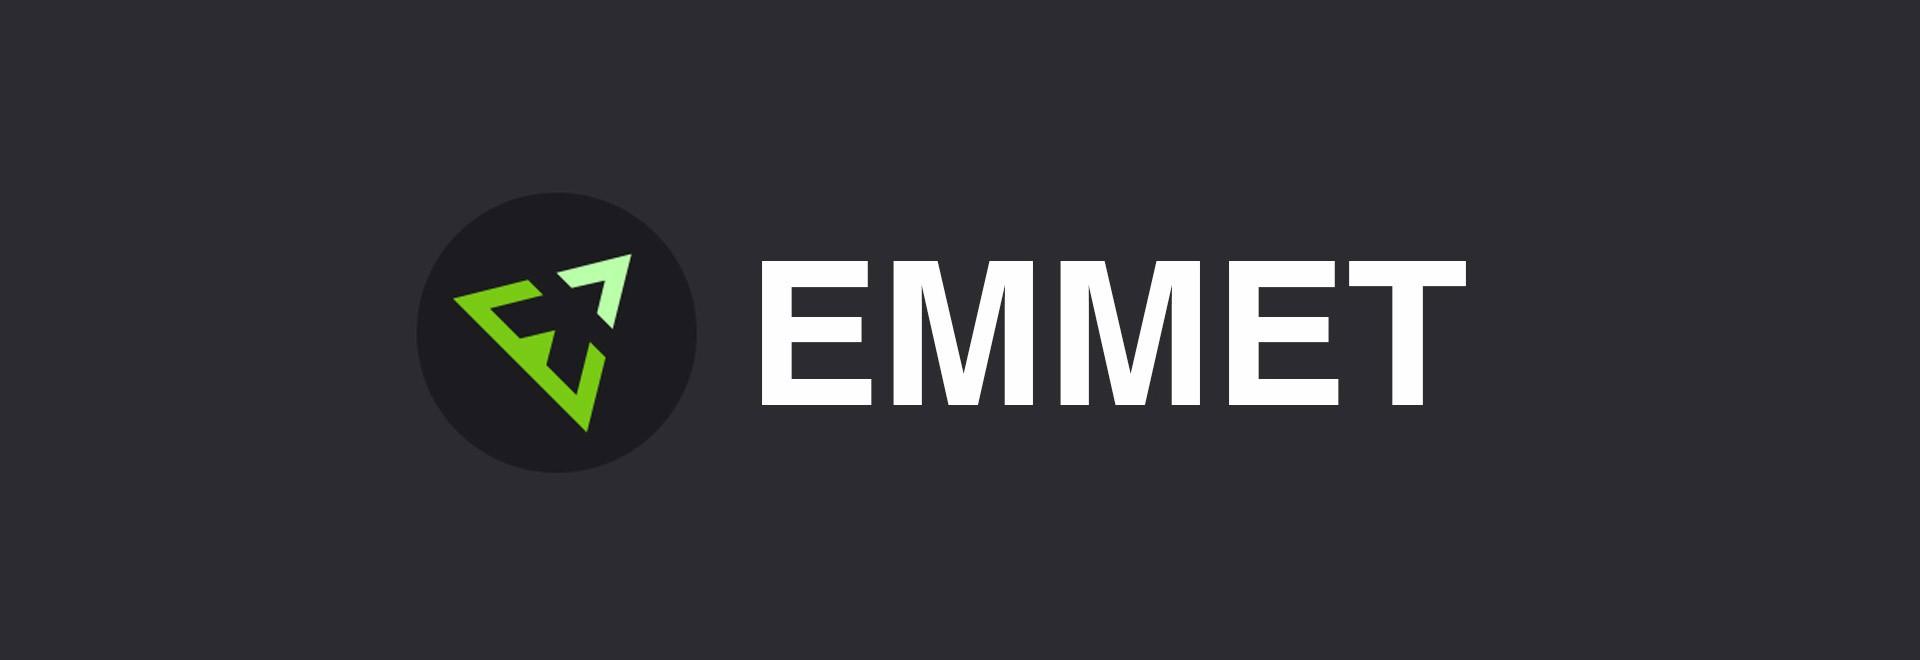 EMMET – Hỗ trợ viết tắt nhanh & gọn cho Developer